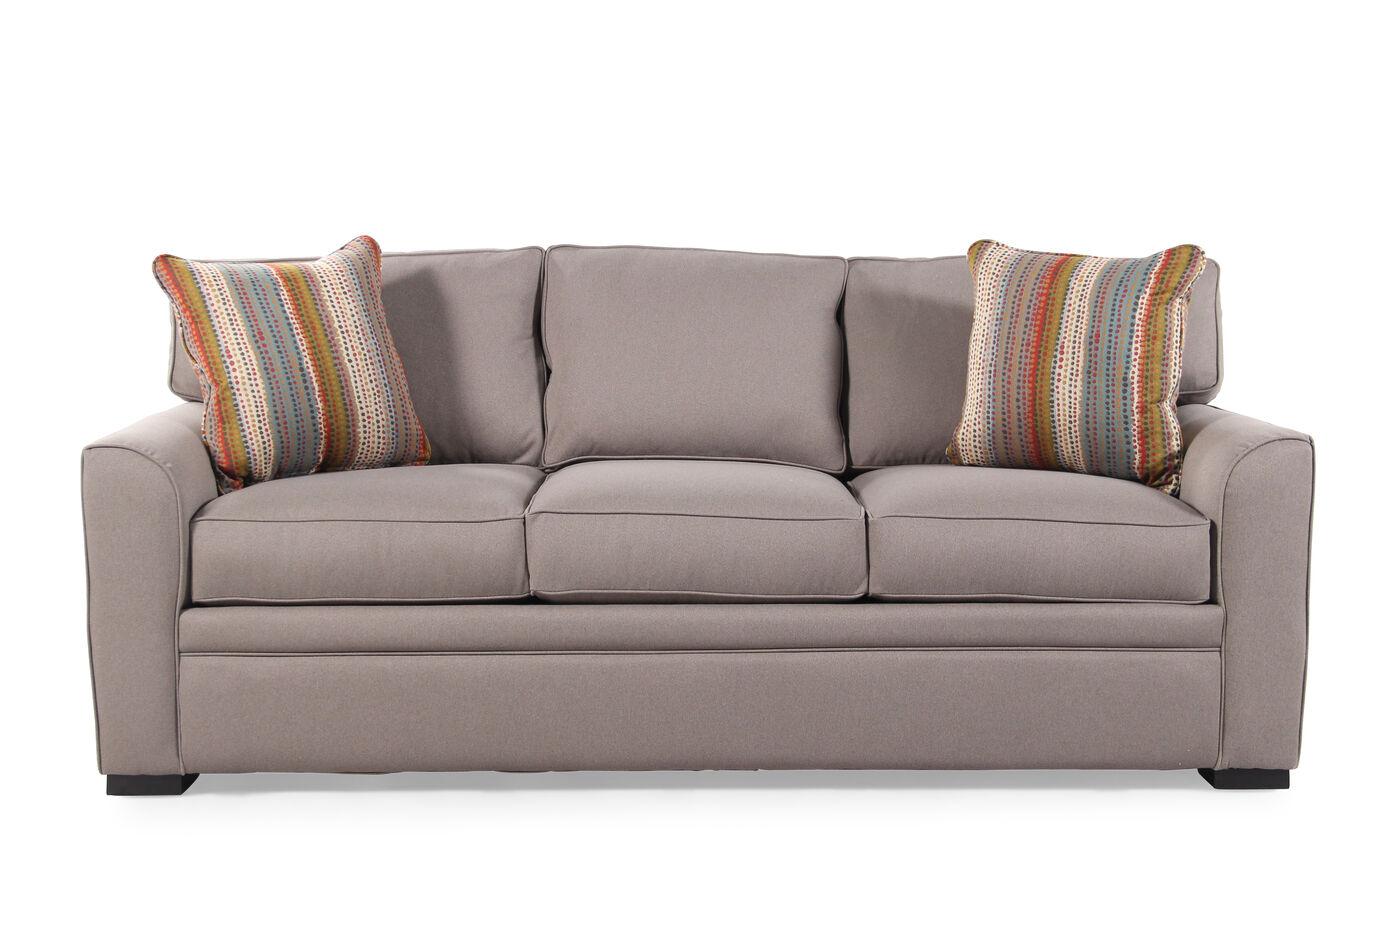 Jonathan Louis Queen Memory Foam Sleeper Sofa